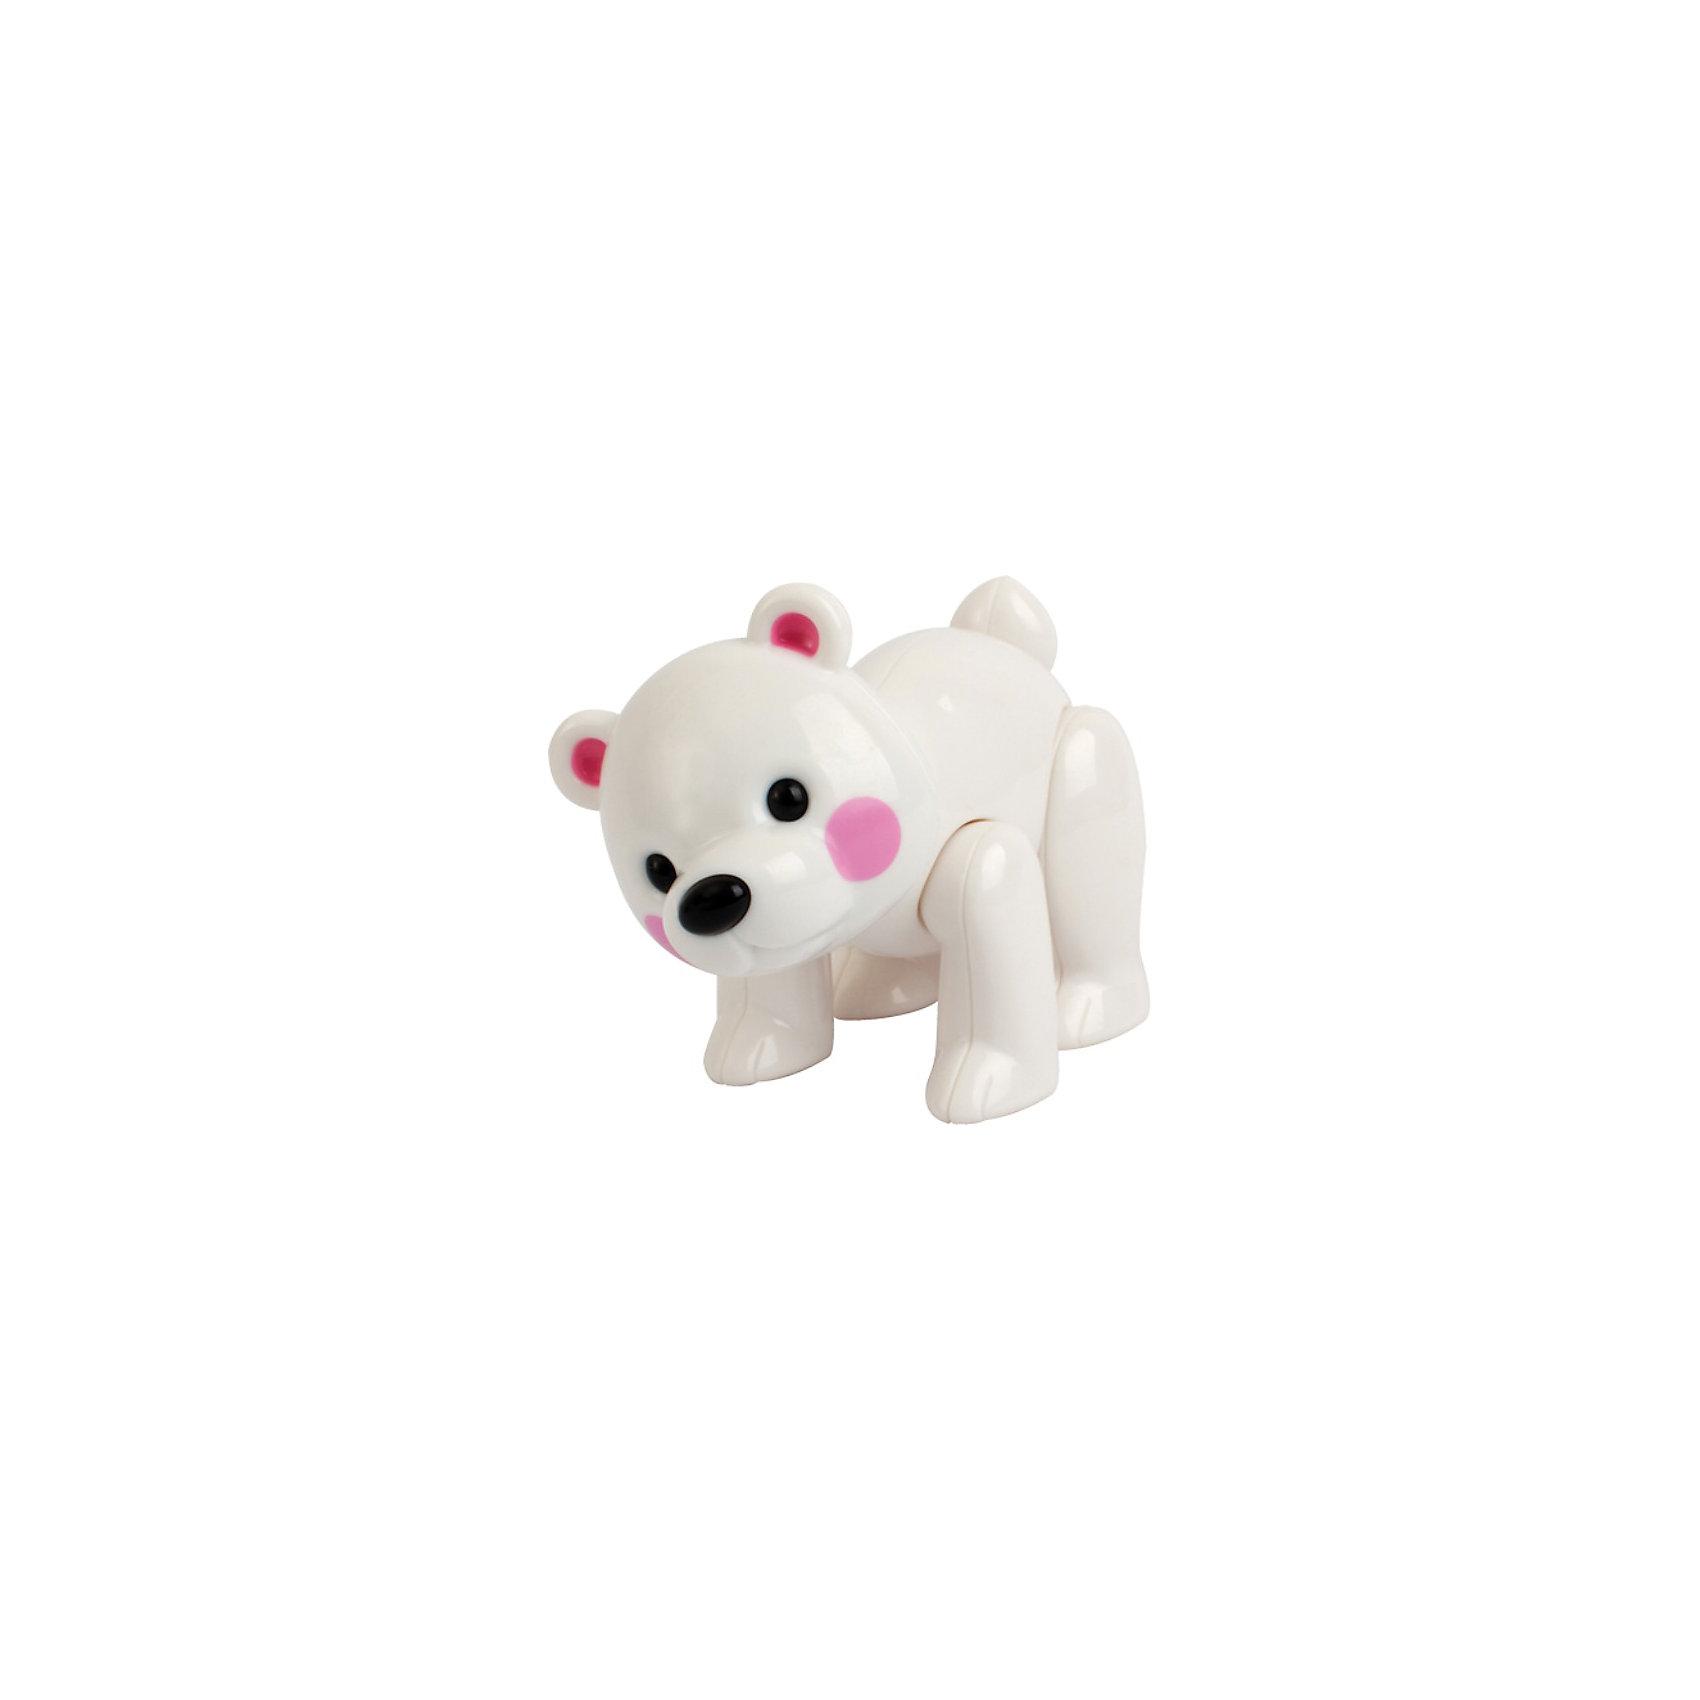 TOLO Фигурка Белый мишка, Первые друзья, TOLO tolo гирлянда медвежата